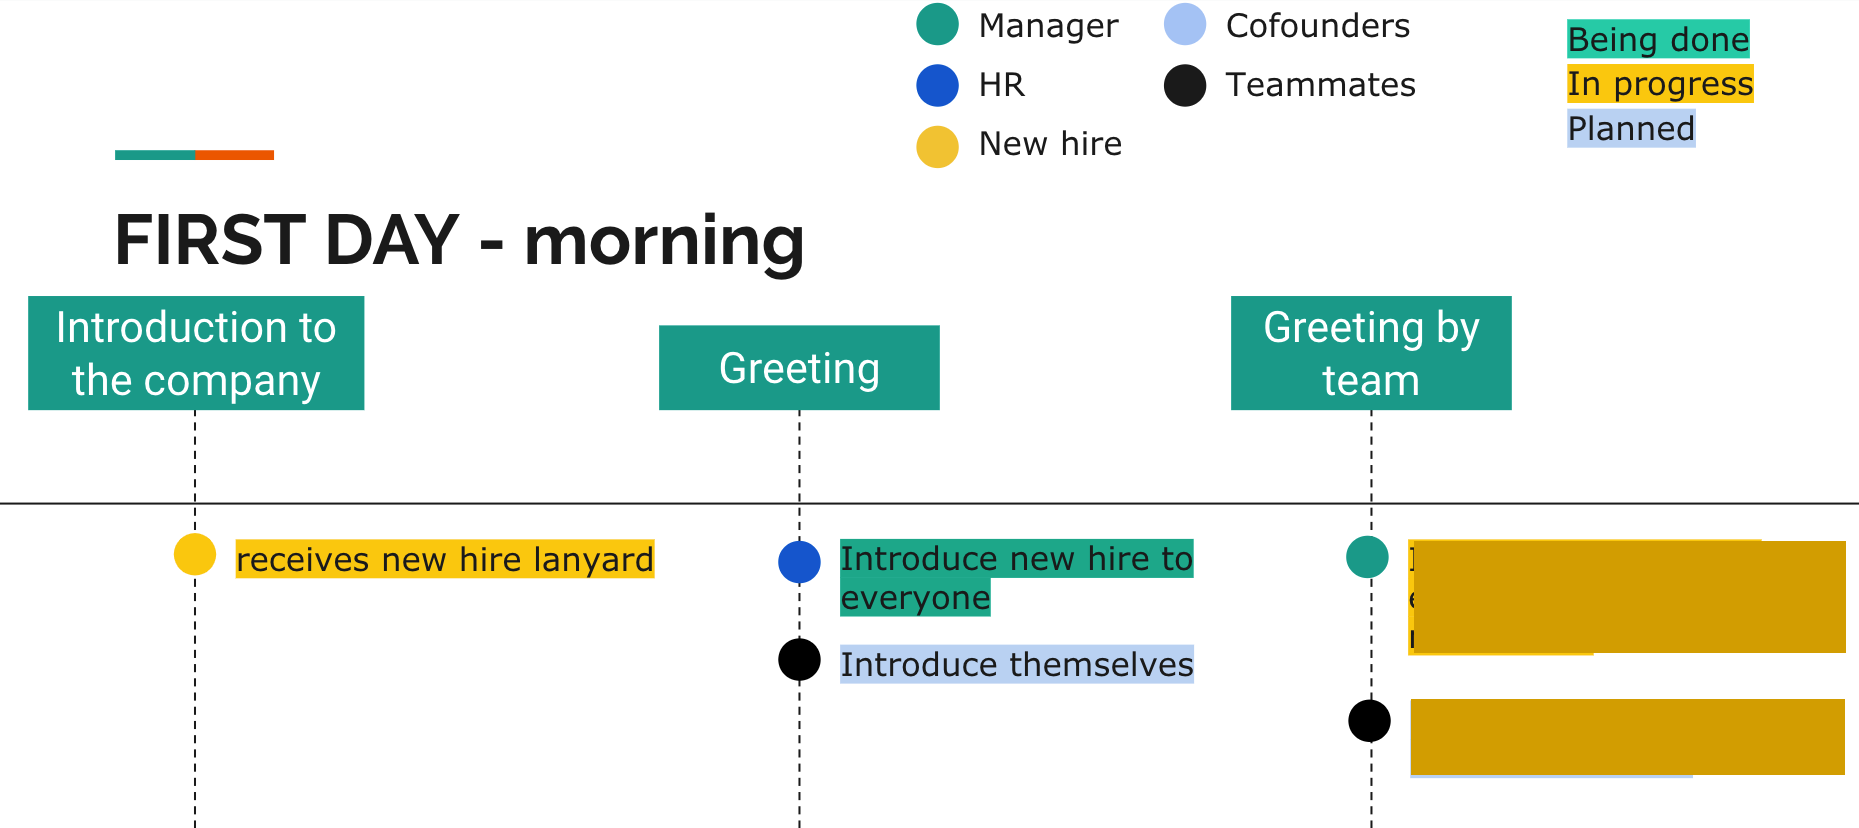 Create an onboarding process